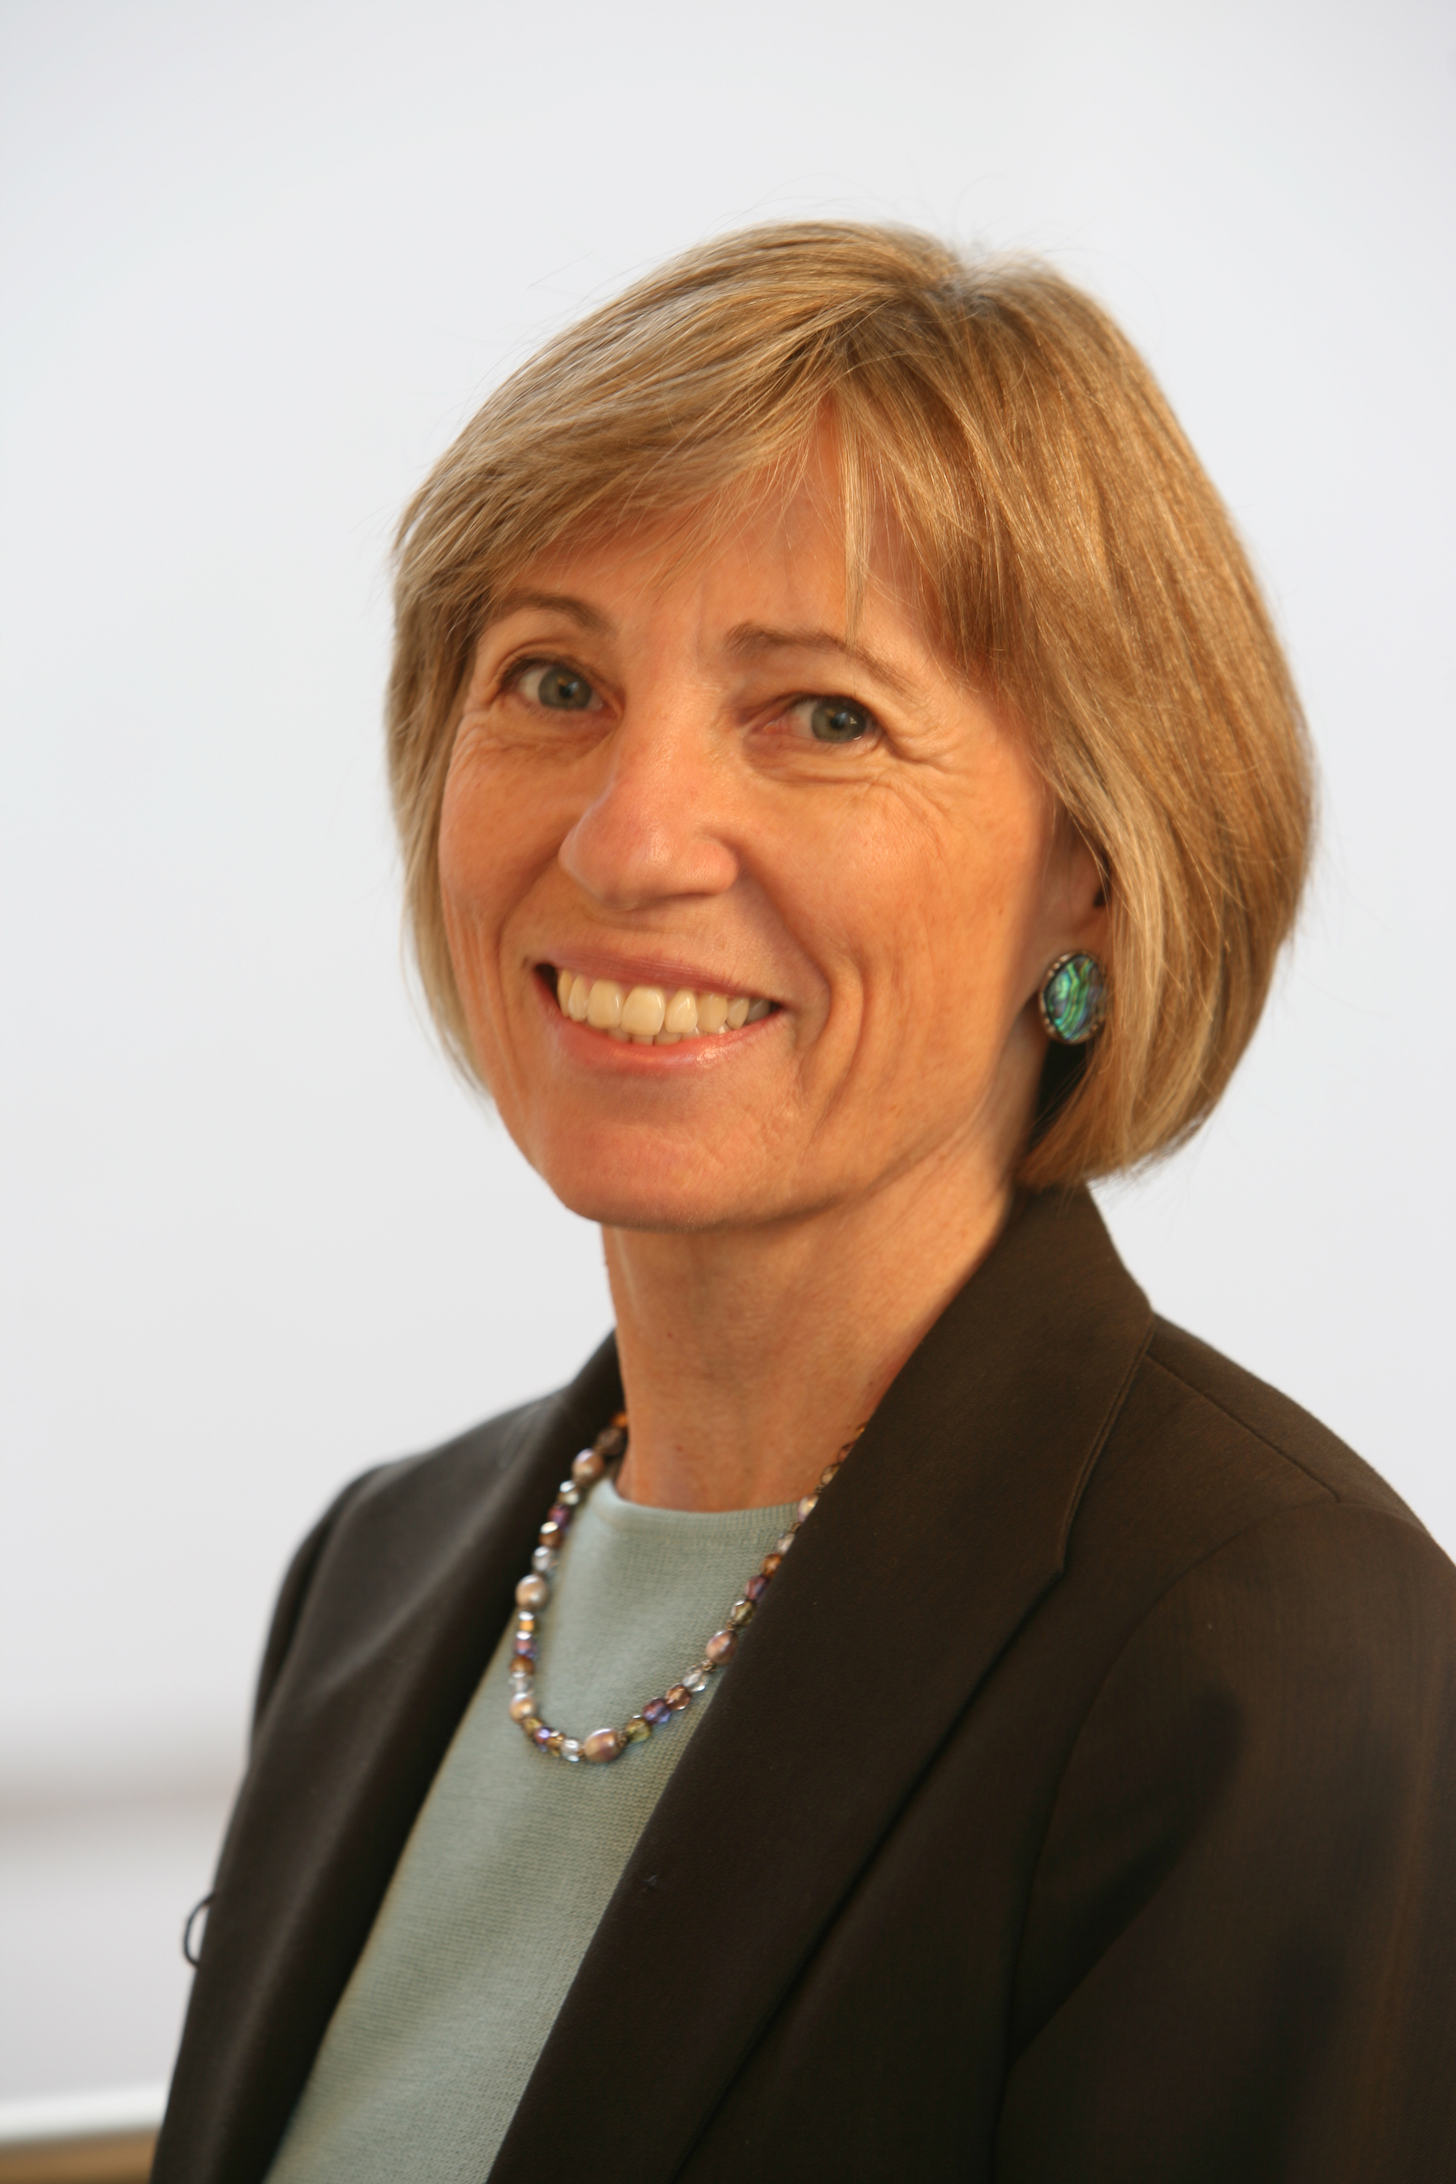 Lynn S. Paine